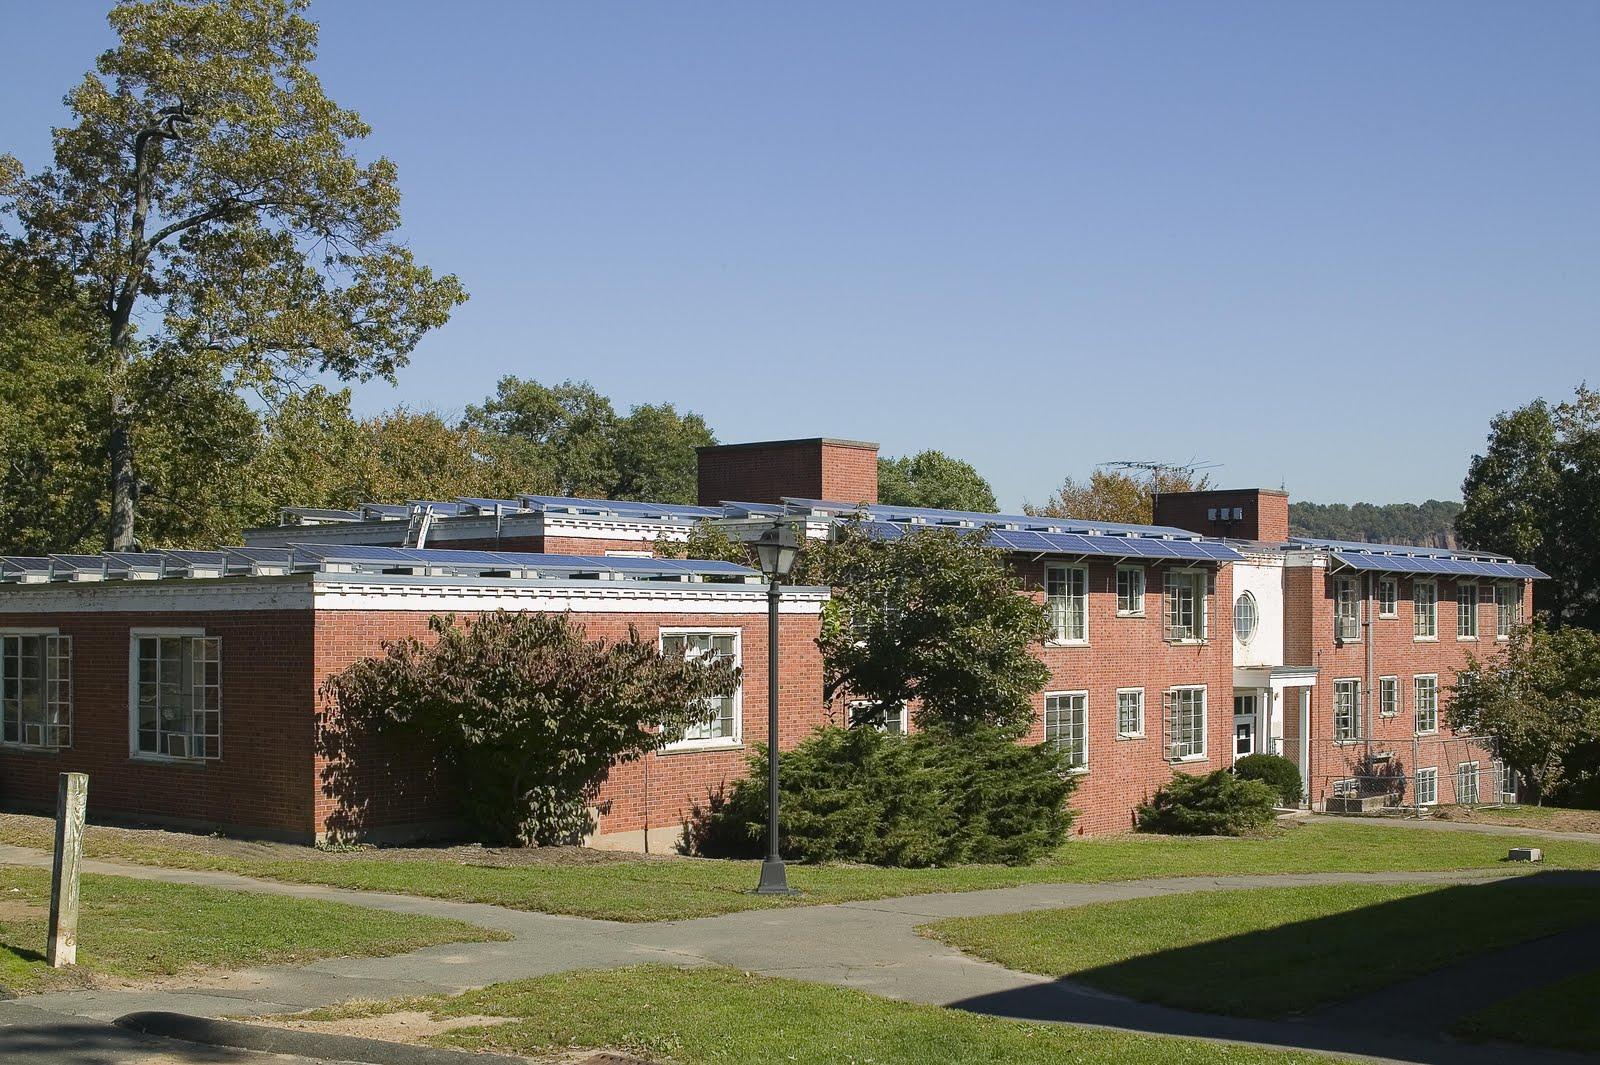 http://3.bp.blogspot.com/-3vCzDQJP1AA/TlJnuYG0ifI/AAAAAAAAD00/2S43gQKDtQw/s1600/Yale_University_Fisher_Hall_Picture_1.jpg